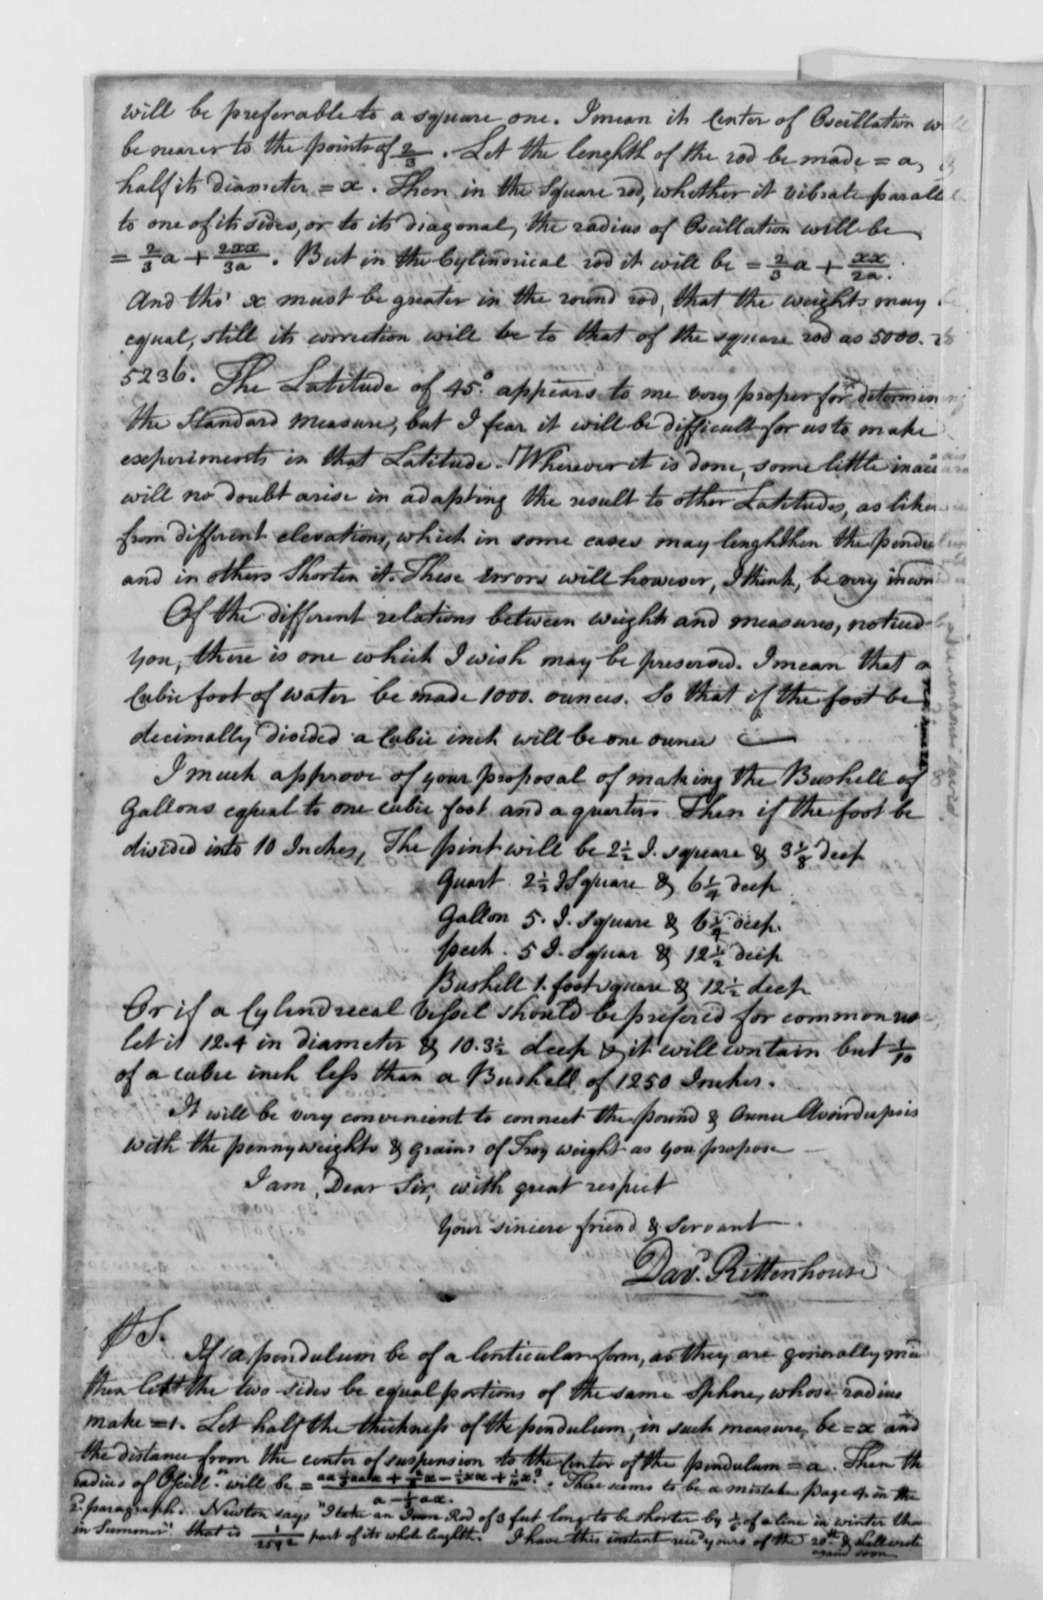 David Rittenhouse to Thomas Jefferson, June 21, 1790